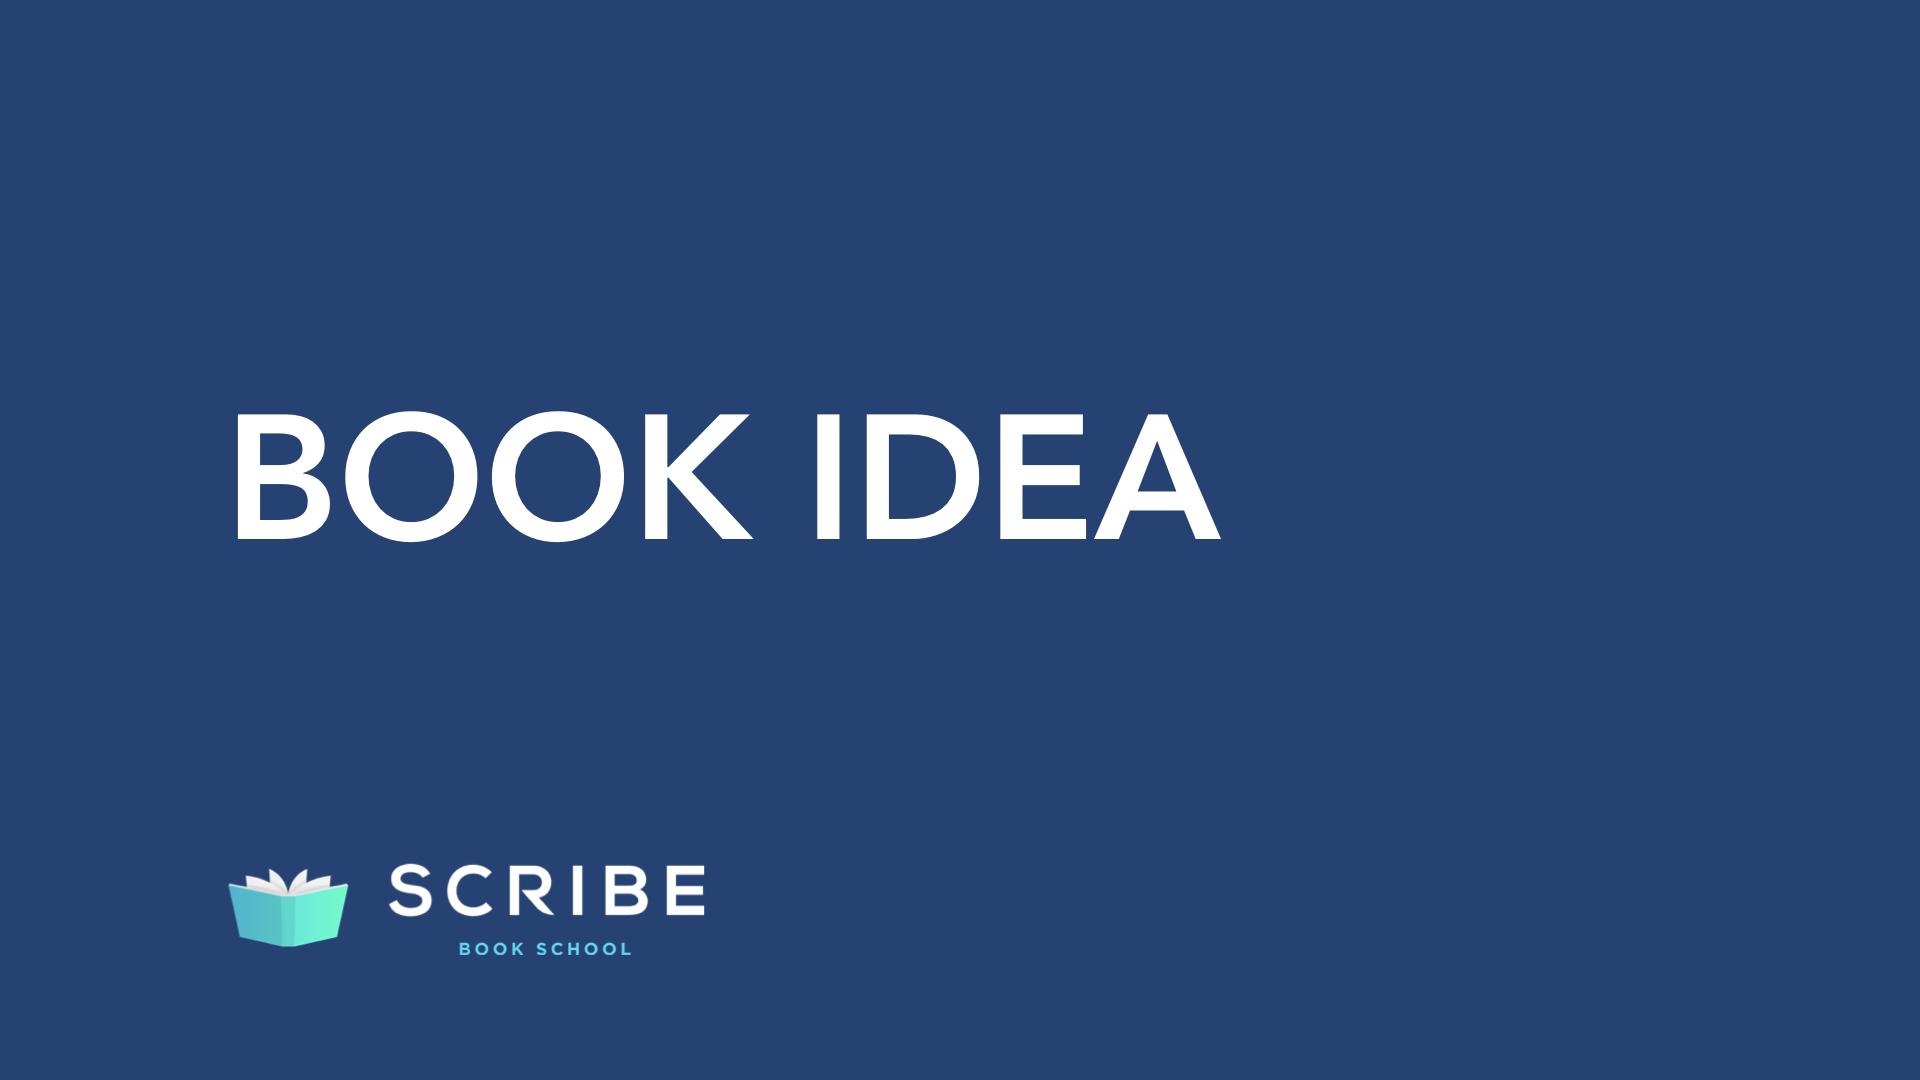 scribe book school book idea